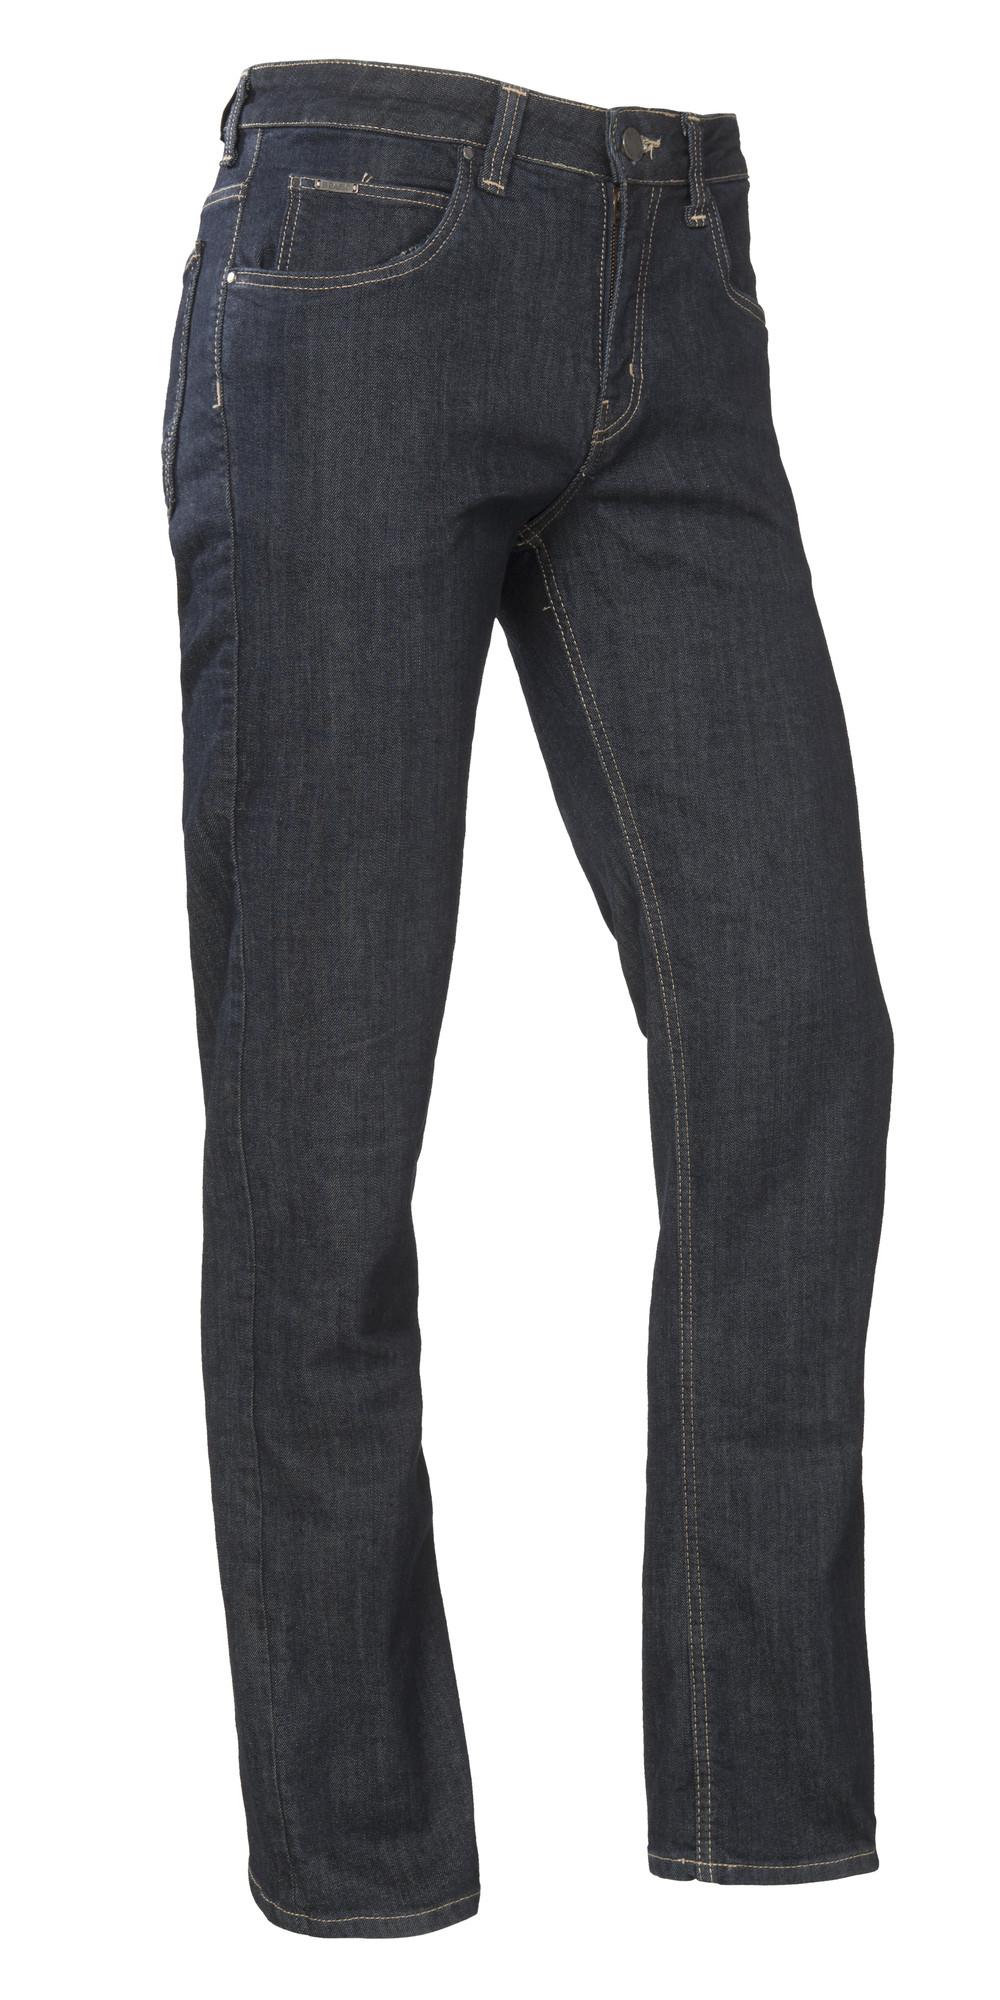 Brams Paris Danny Jeans Stretch (C94 BlueBLackDenim) W32-L36